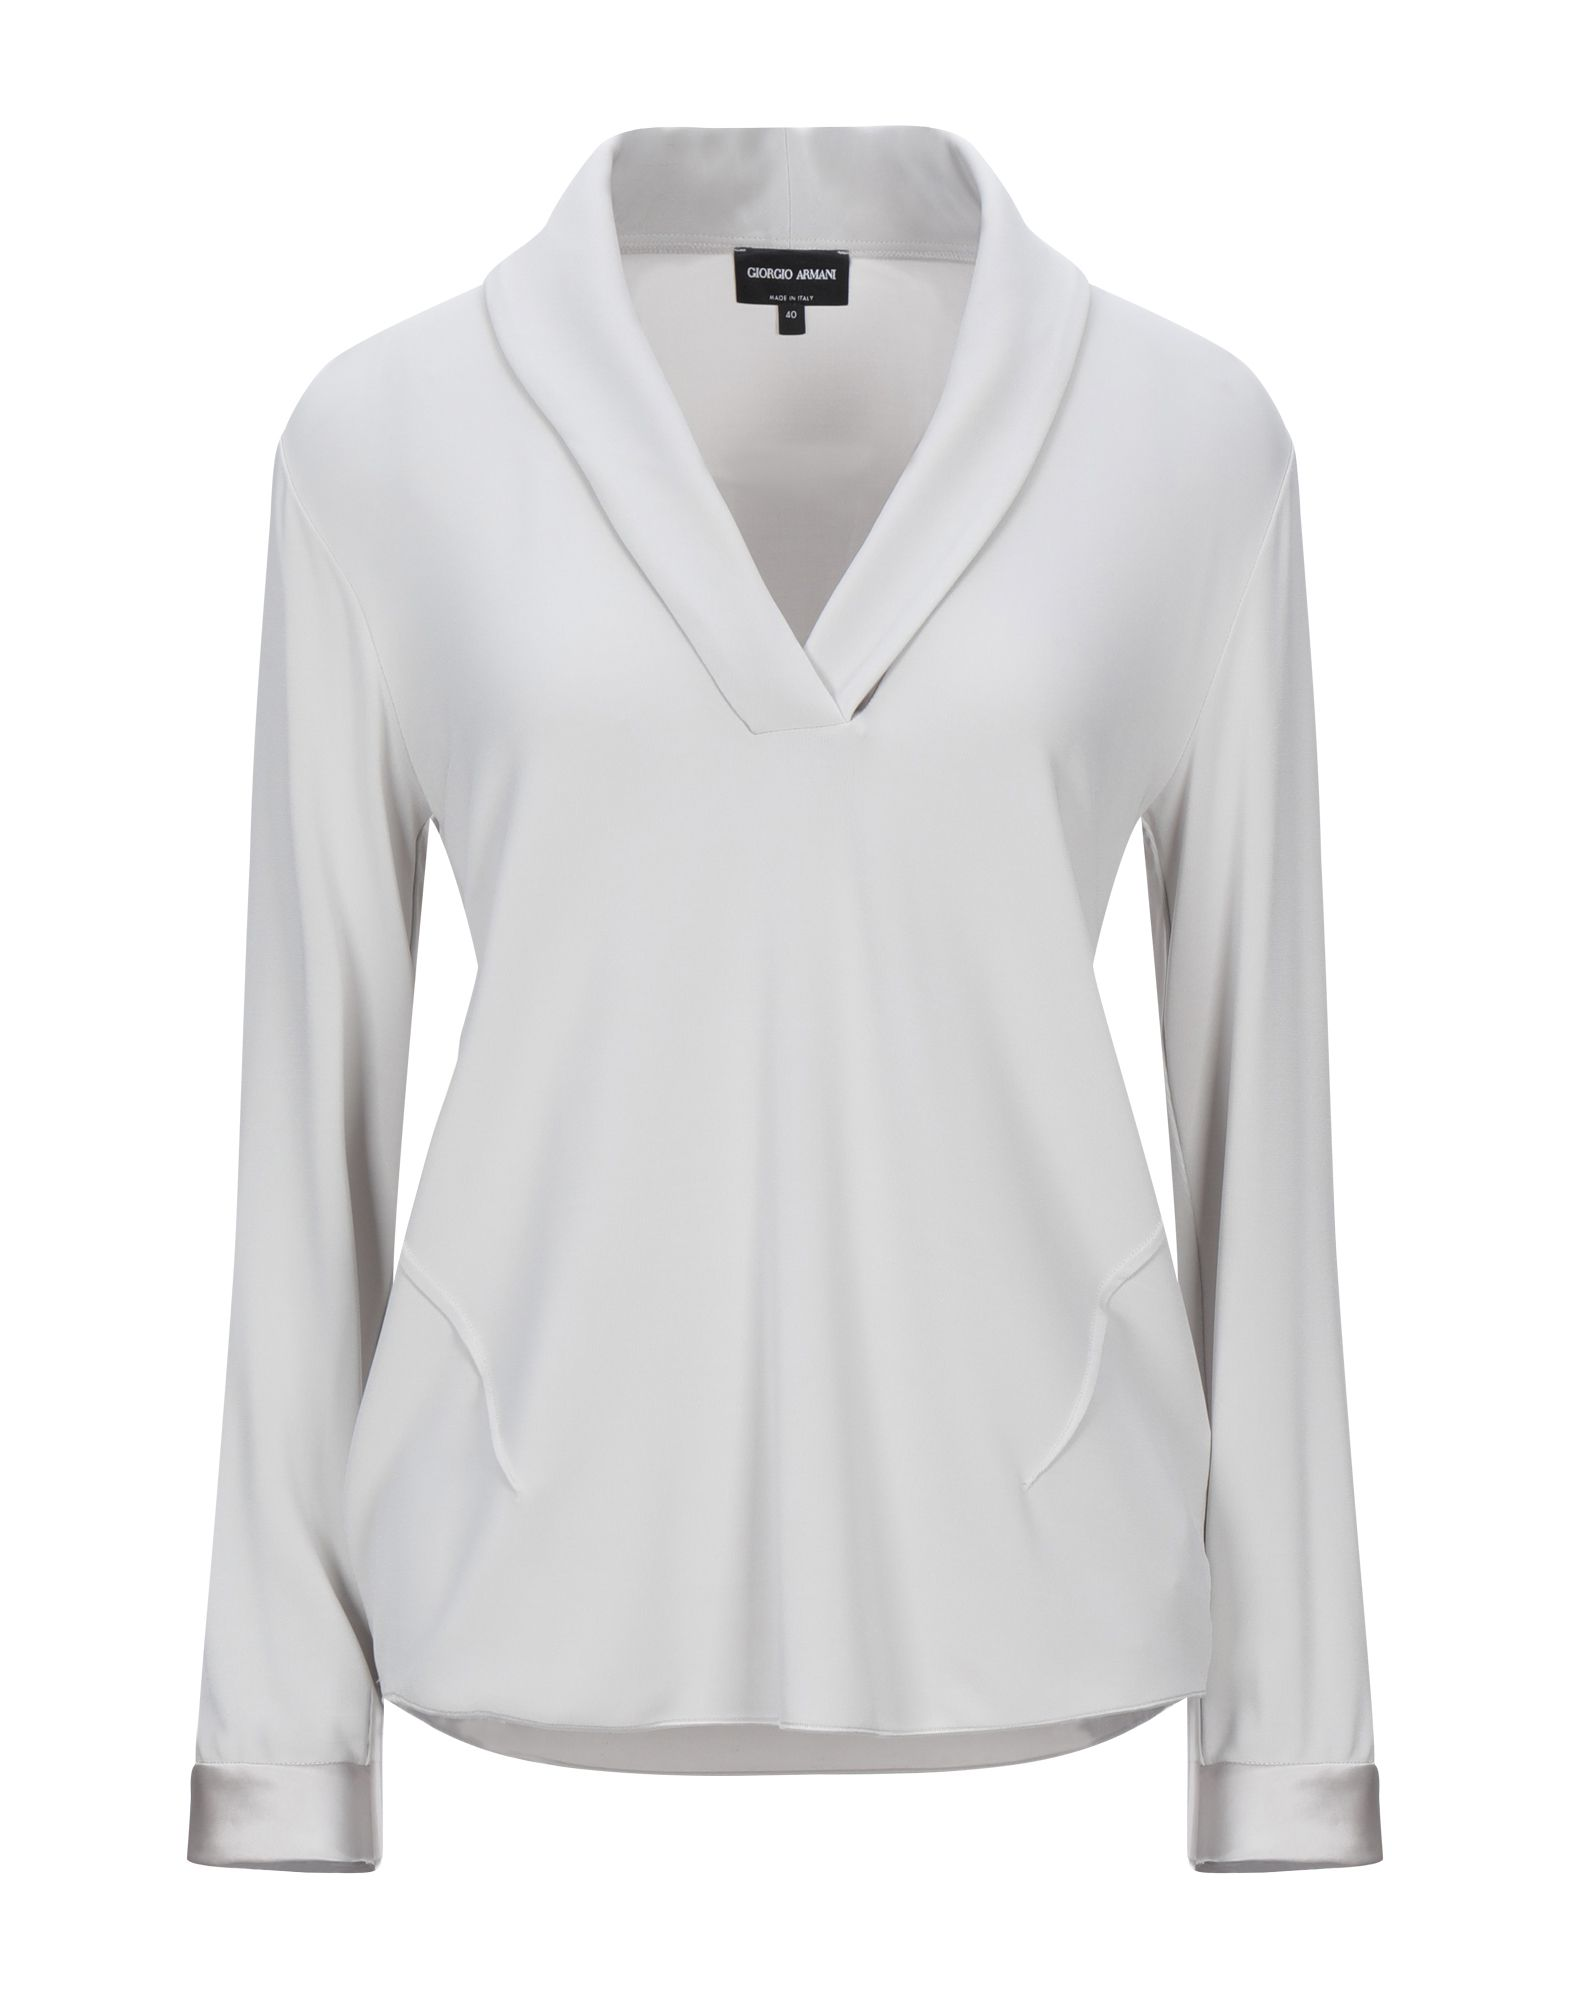 GIORGIO ARMANI T-shirts. jersey, no appliqués, basic solid color, v-neck, long sleeves, stretch, small sized. 95% Viscose, 5% Elastane